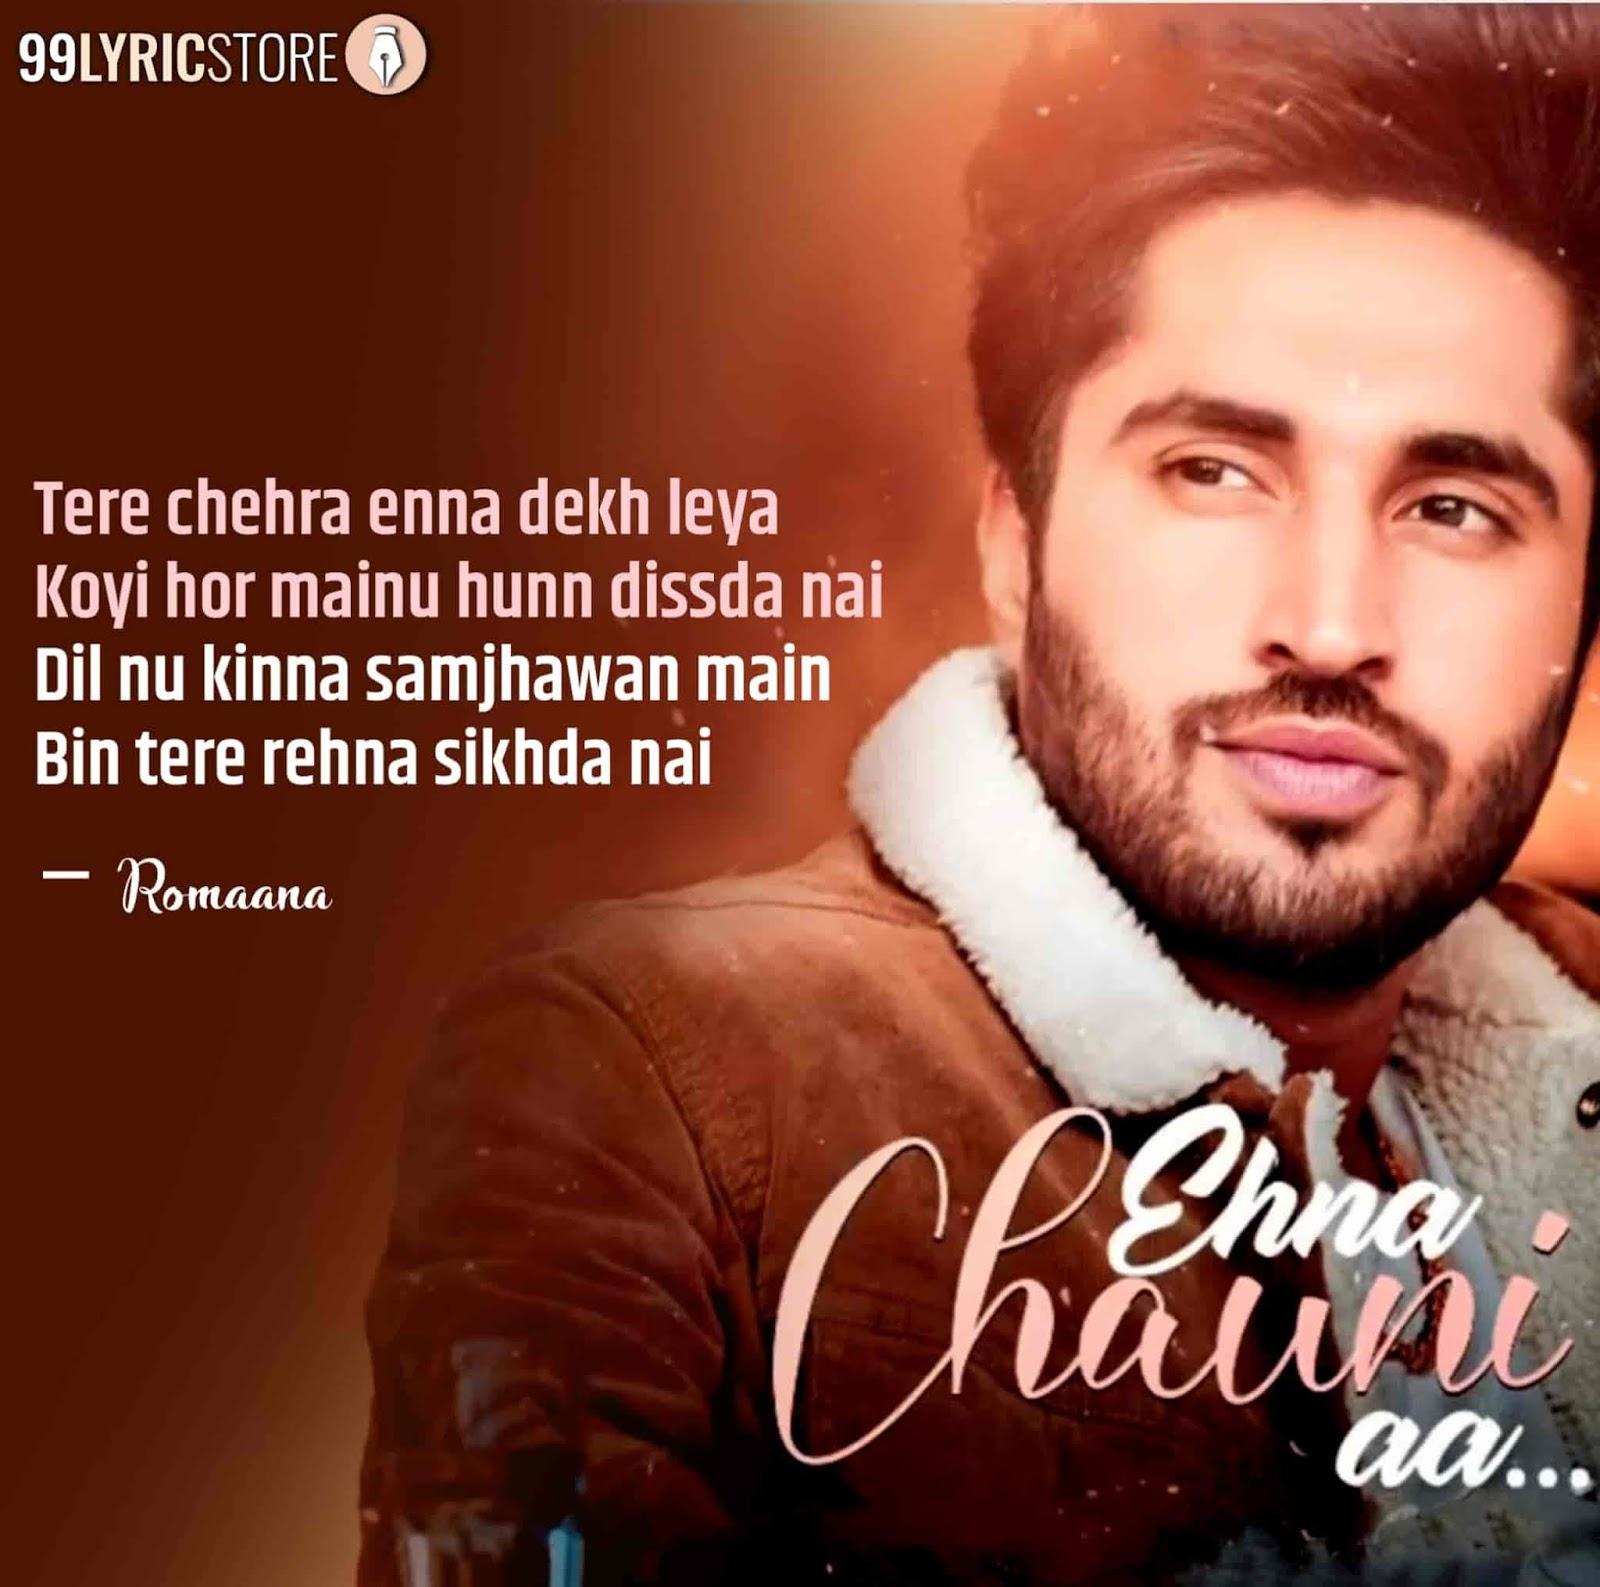 Ehna Chauni Aa Punjabi Song Image By Jassie Gill